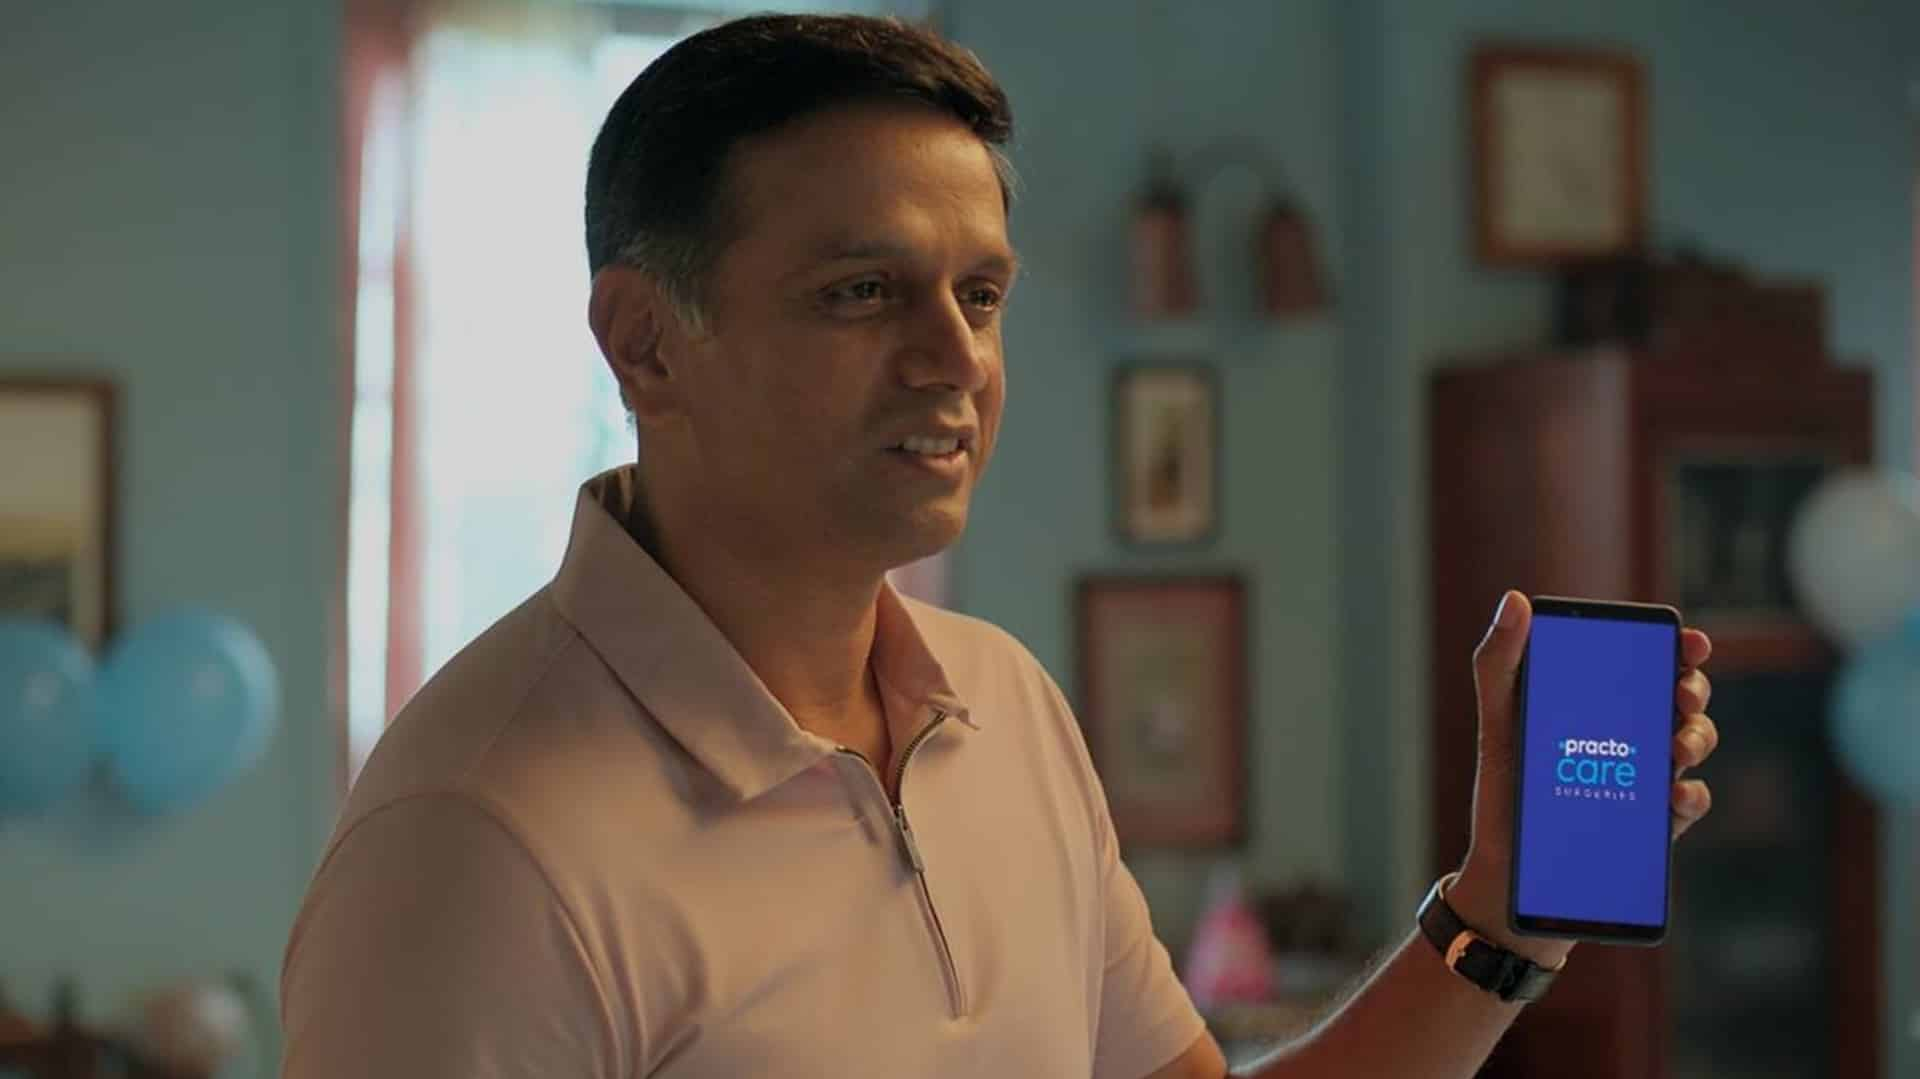 Practo ropes in Rahul Dravid as brand ambassador